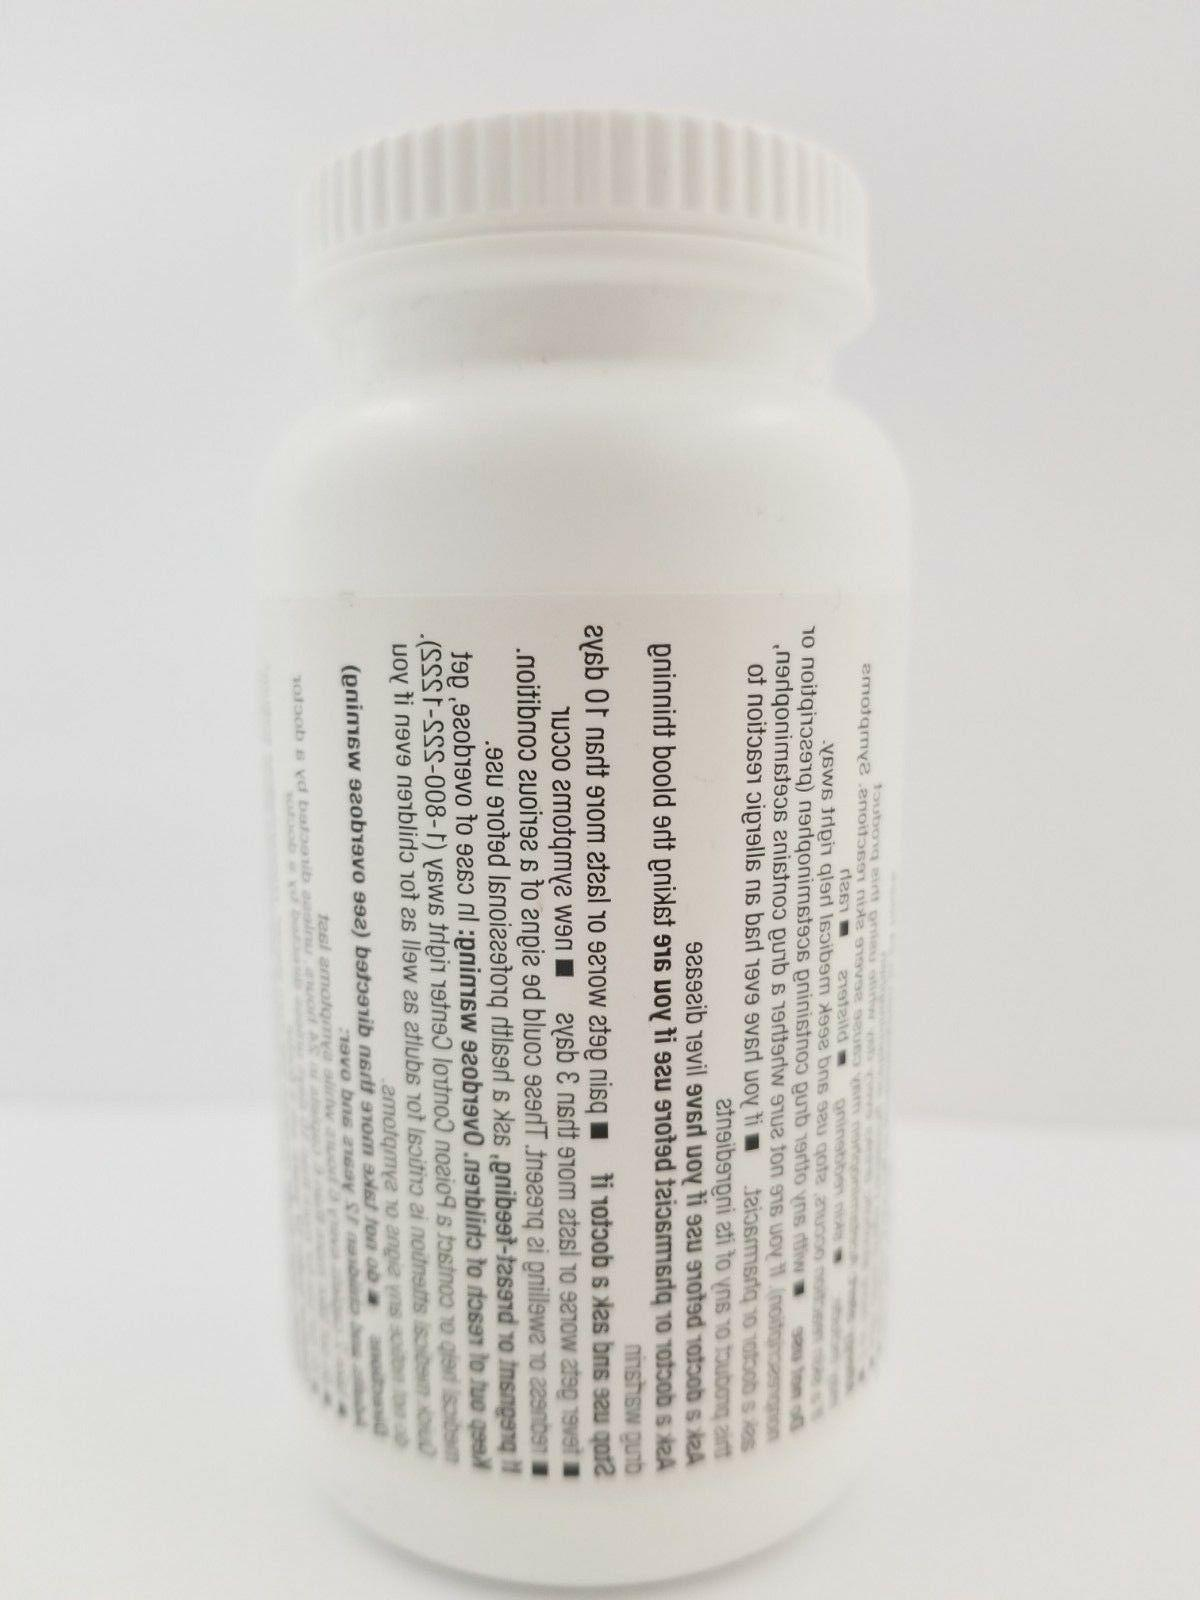 Equate Extra mg Acetaminophen Relief 250 Caplets